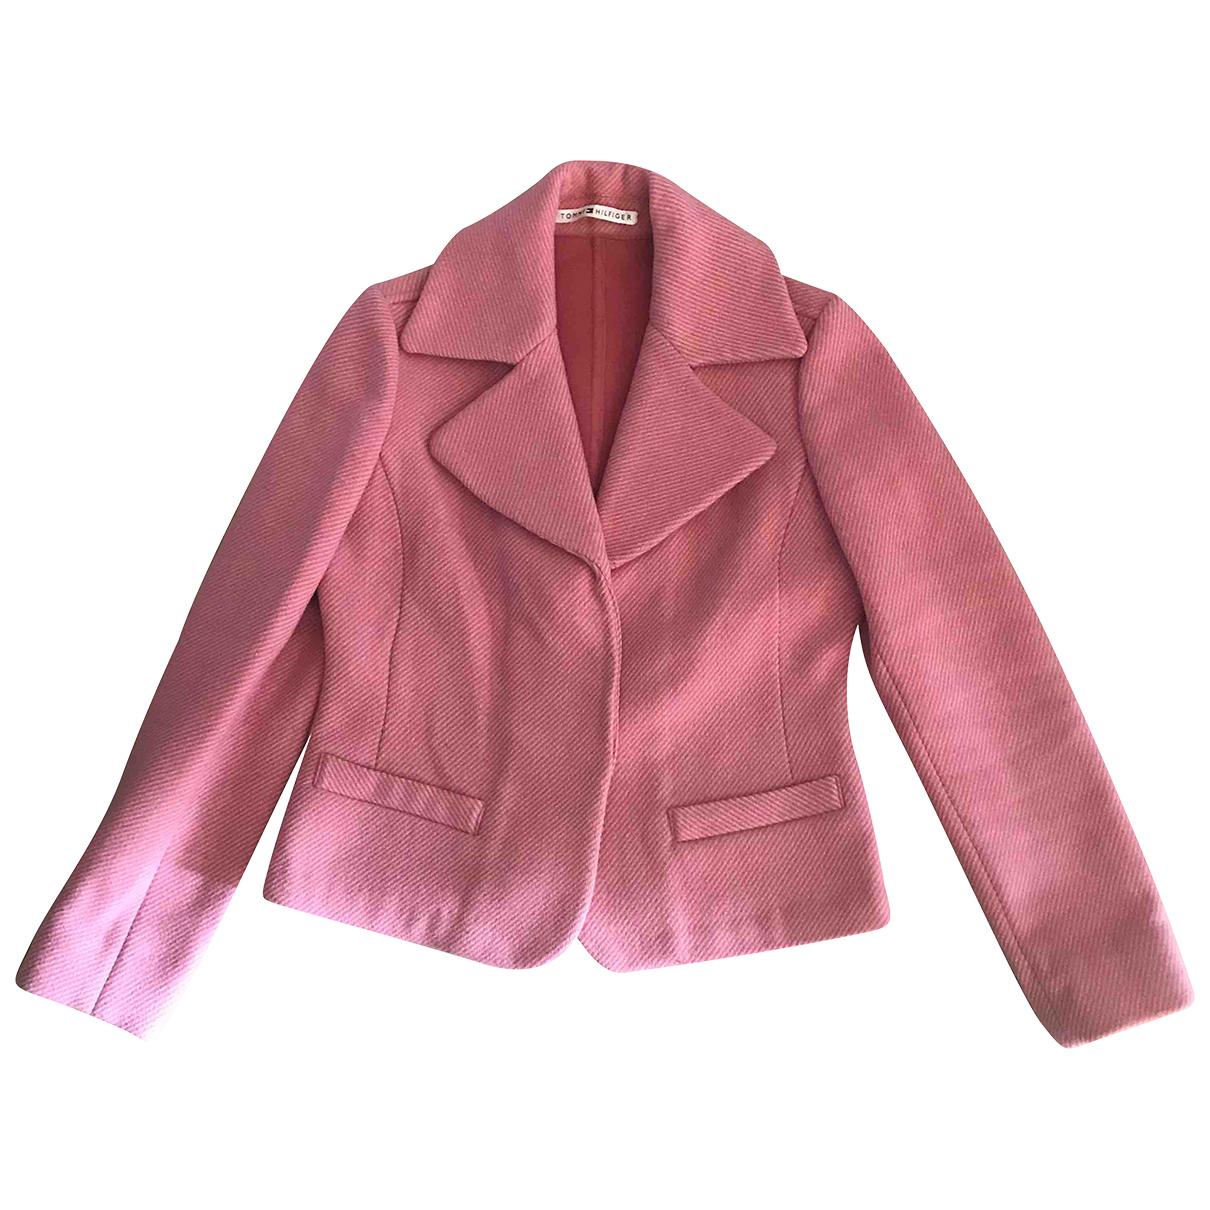 Tommy Hilfiger - Veste   pour femme en laine - rose